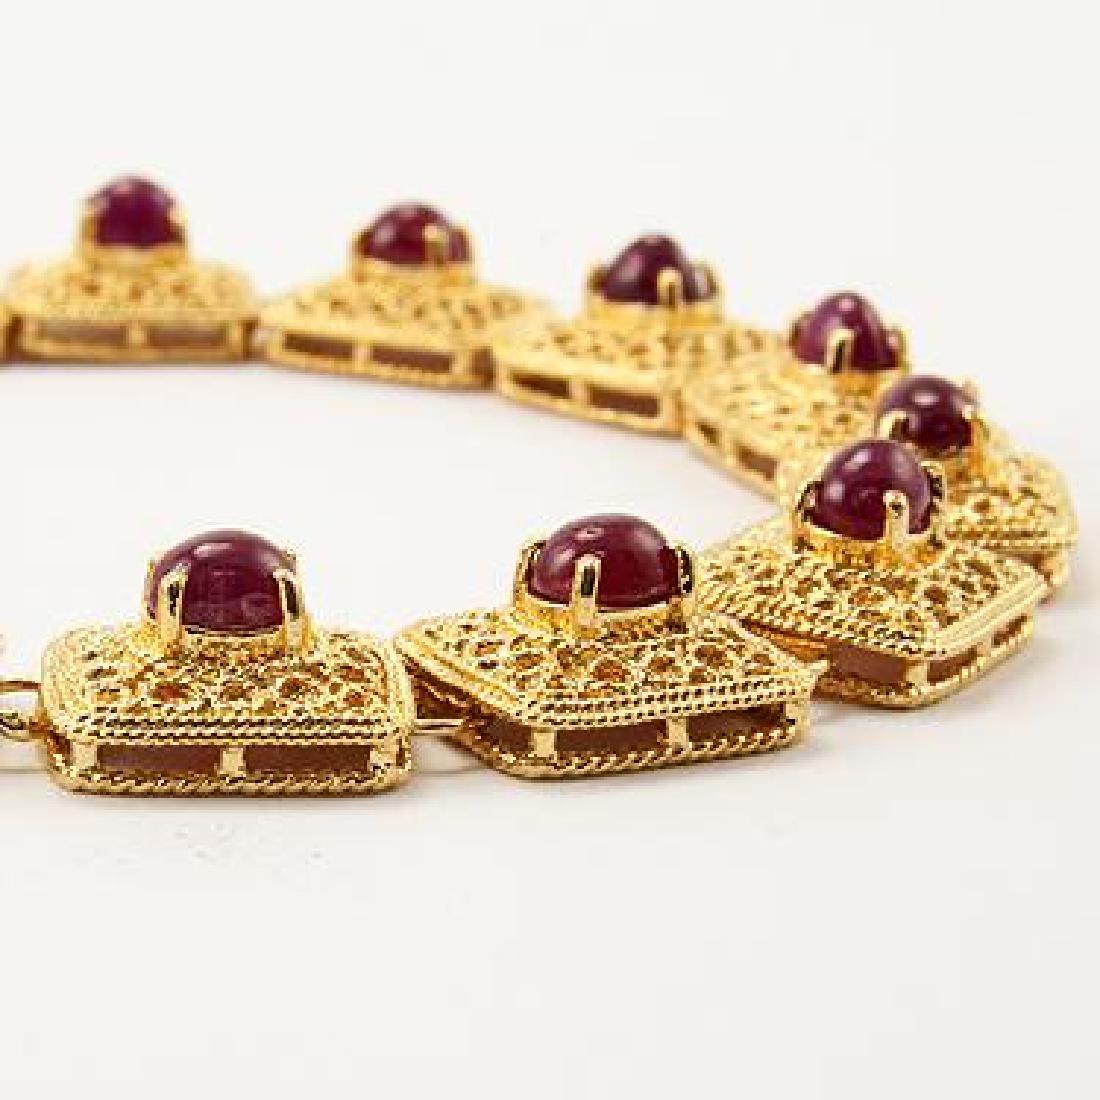 7 CT Cabochon Ruby Gold Bracelet - 2